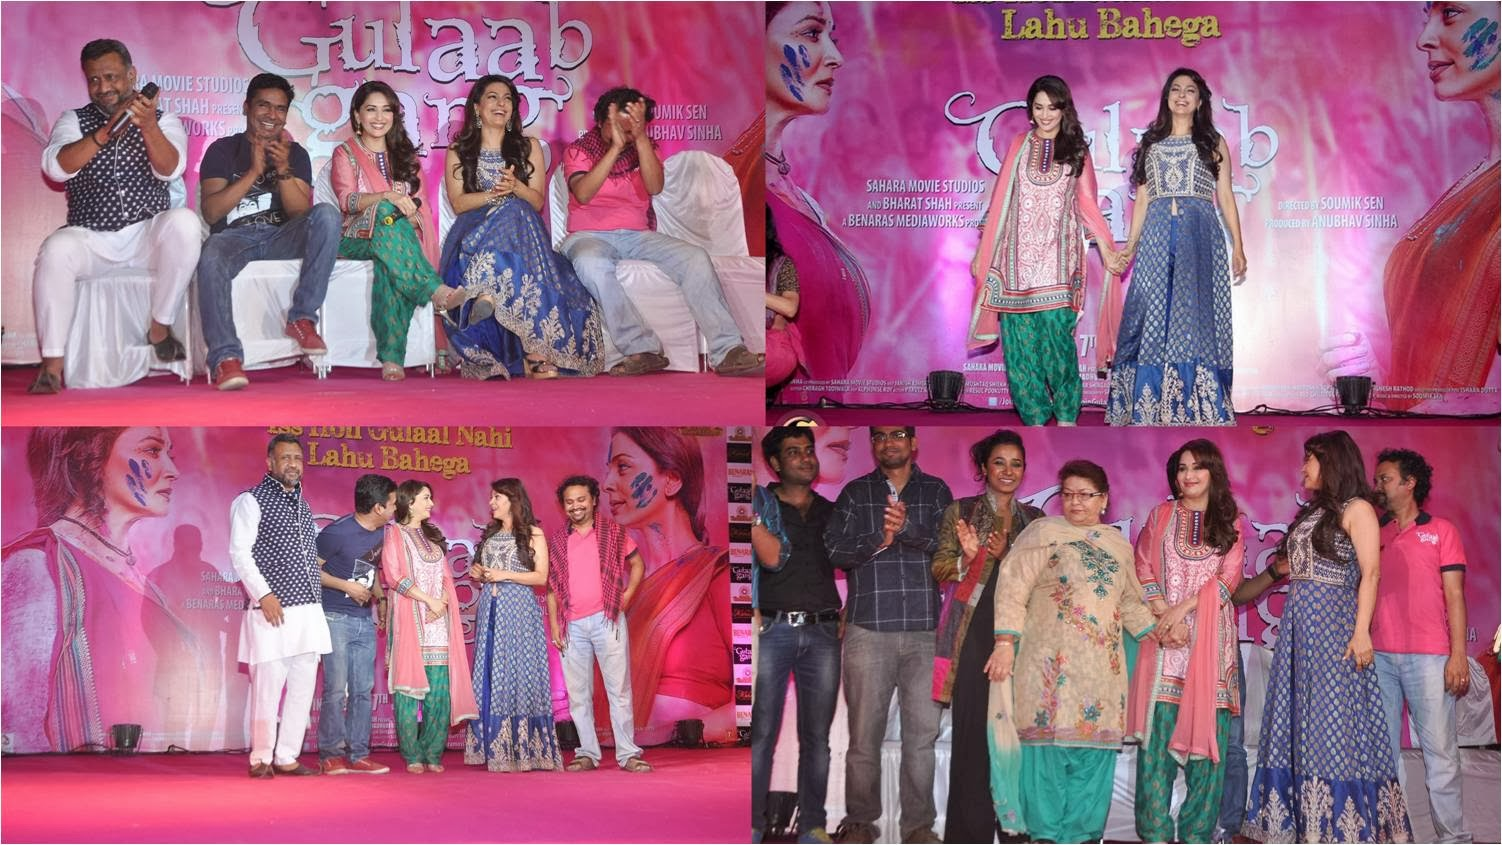 Star studded Gulaab Gang trailer launch saw gorgeous Madhuri, stunning Juhi, renowned choreographer Saroj Khan and the team